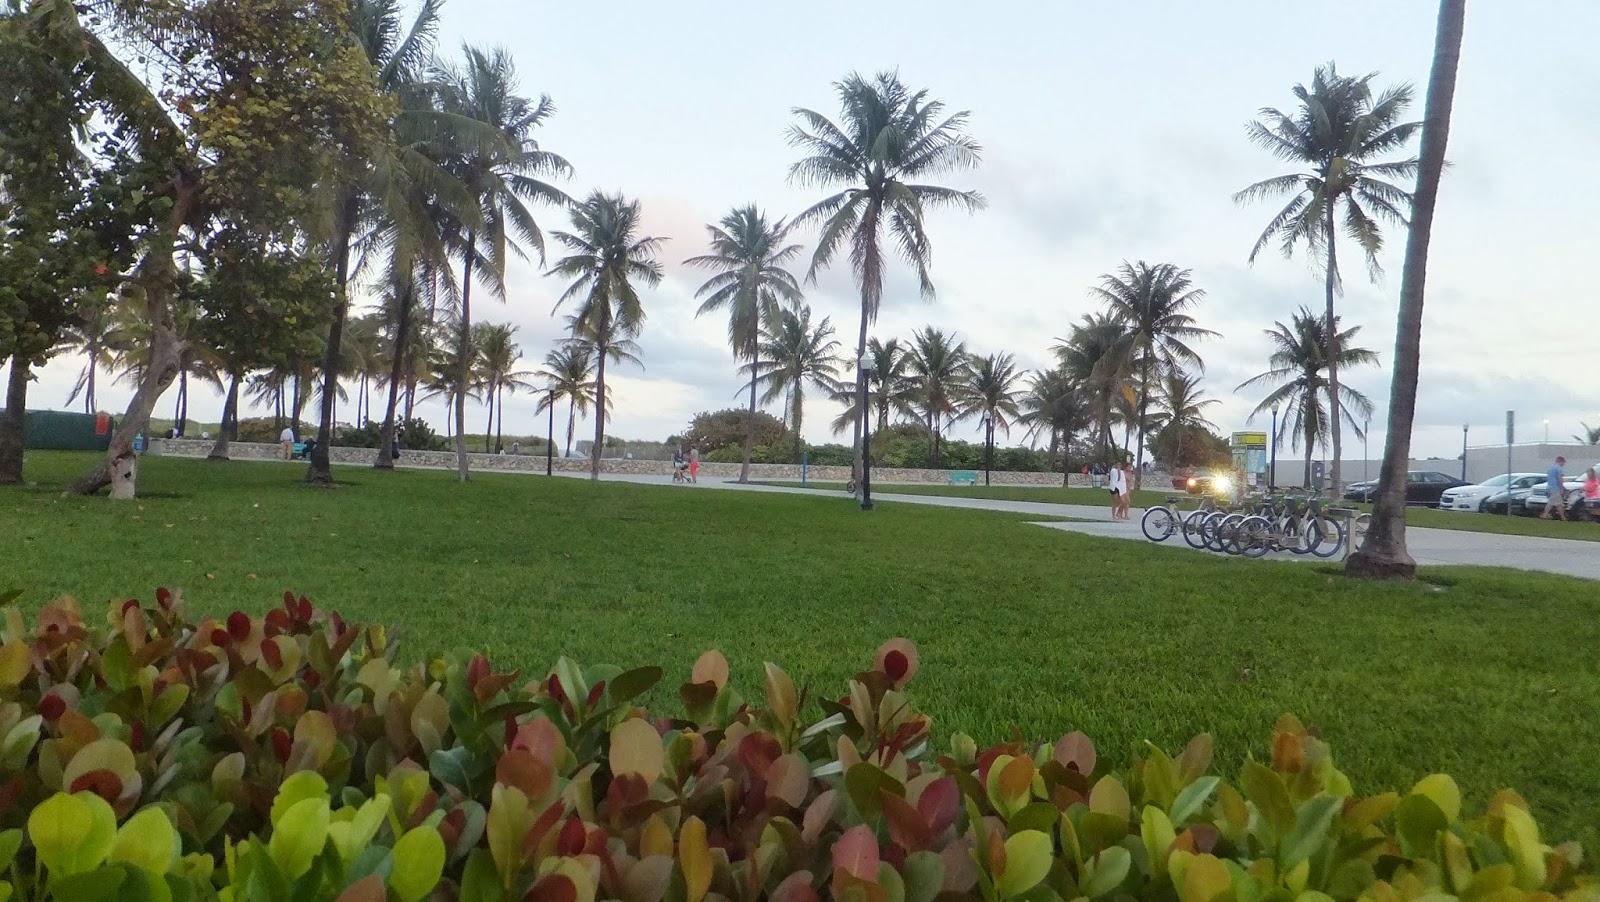 Ocean Drive, Miami Beach, SoBe, Florida, Elisa N, Blog de Viajes, Lifestyle, Travel